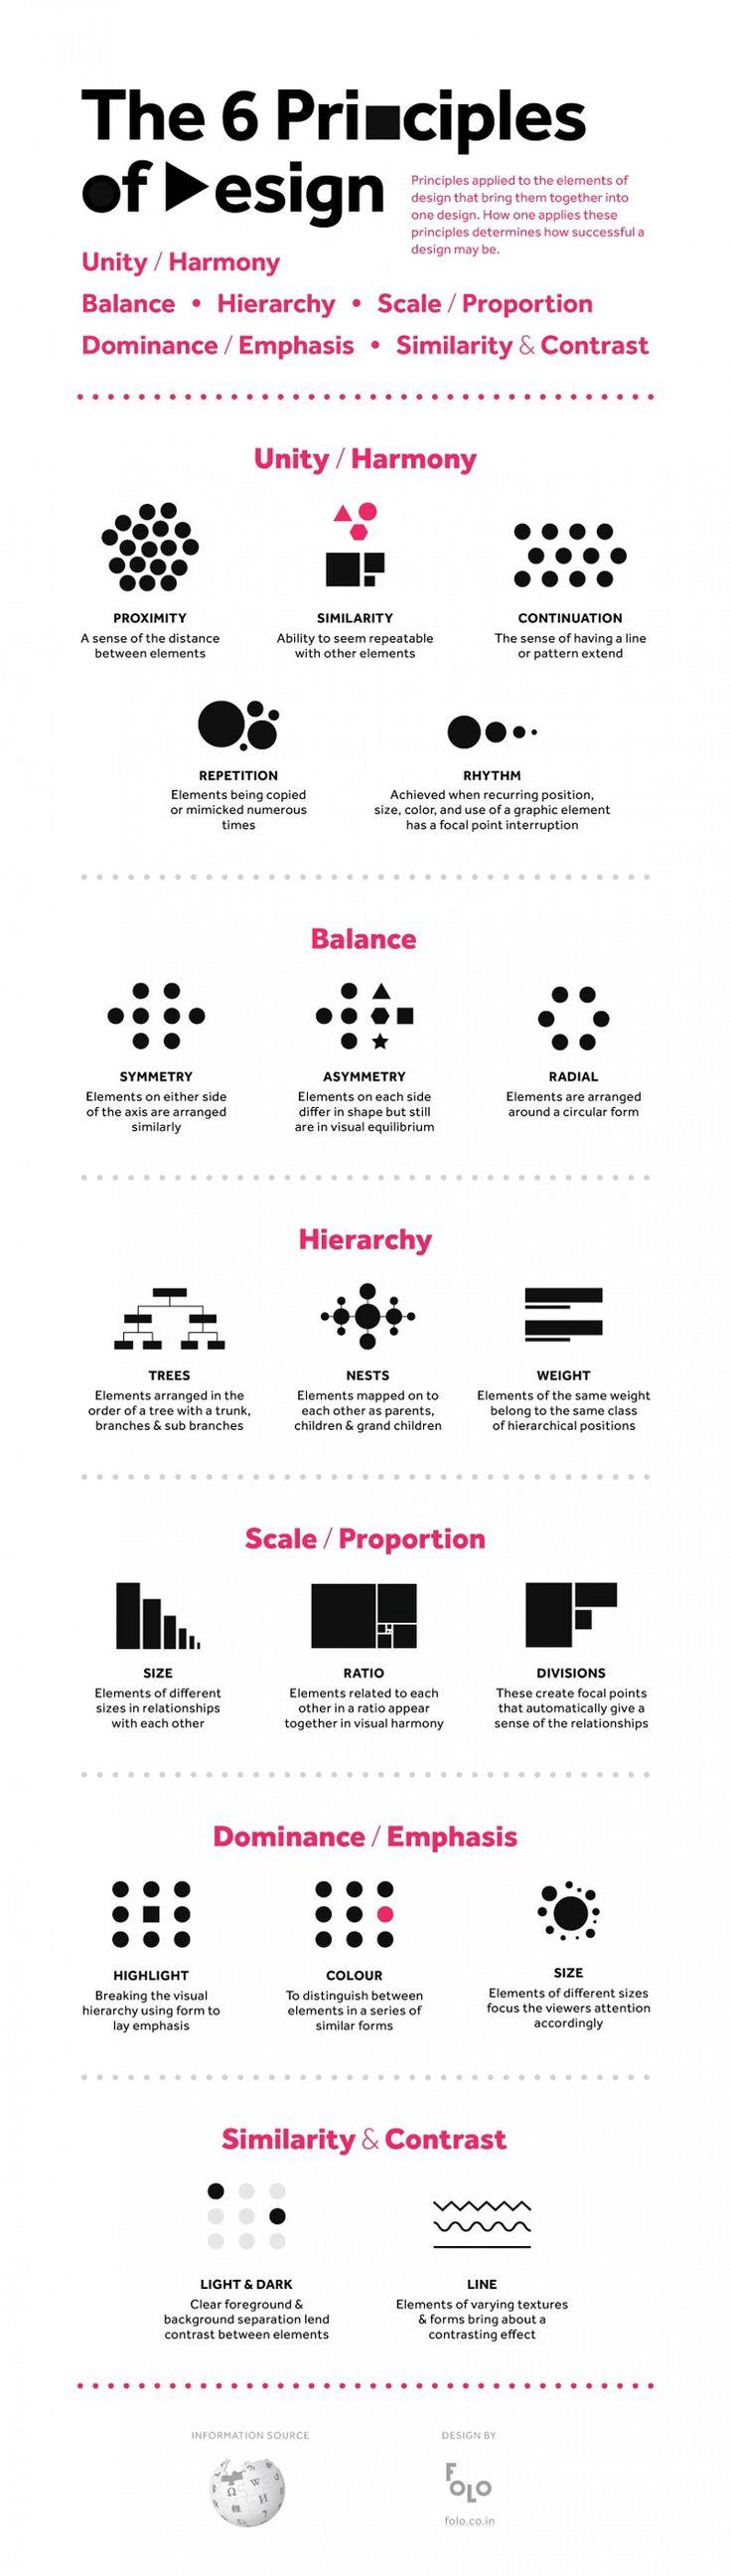 6-principles-of-design